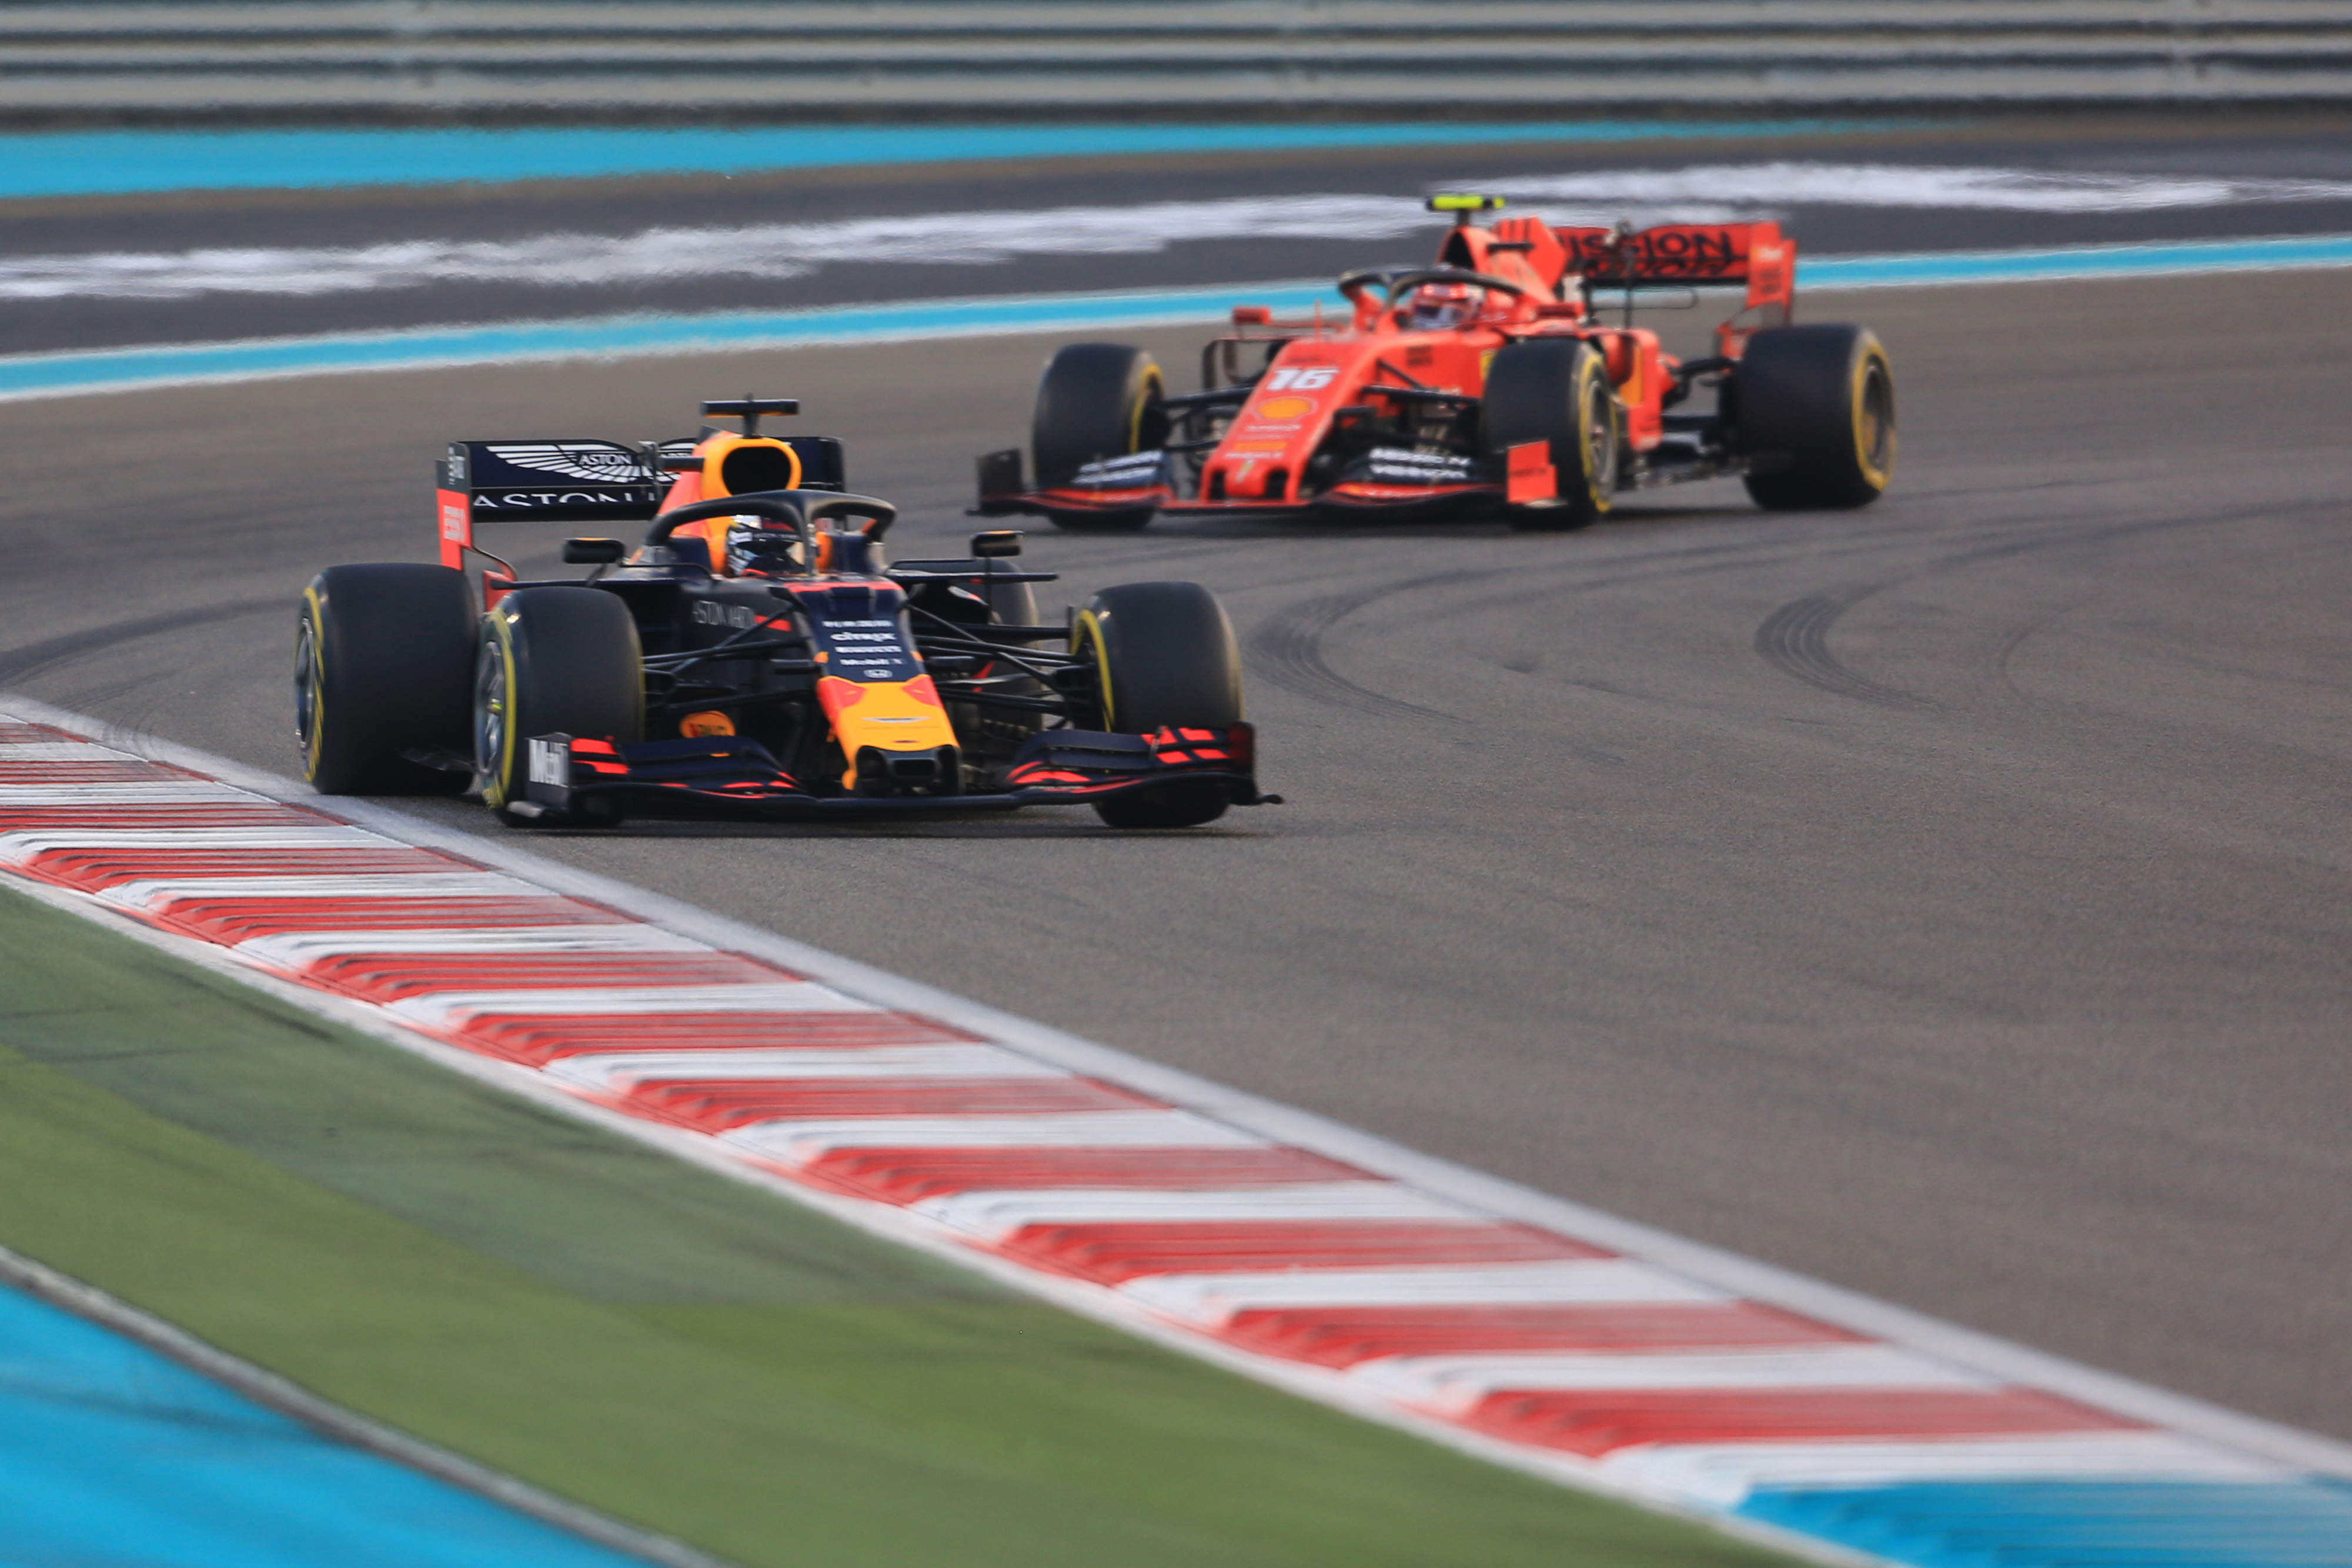 F1 Formula 1 Formula One Max Verstappen torque holes on throttle